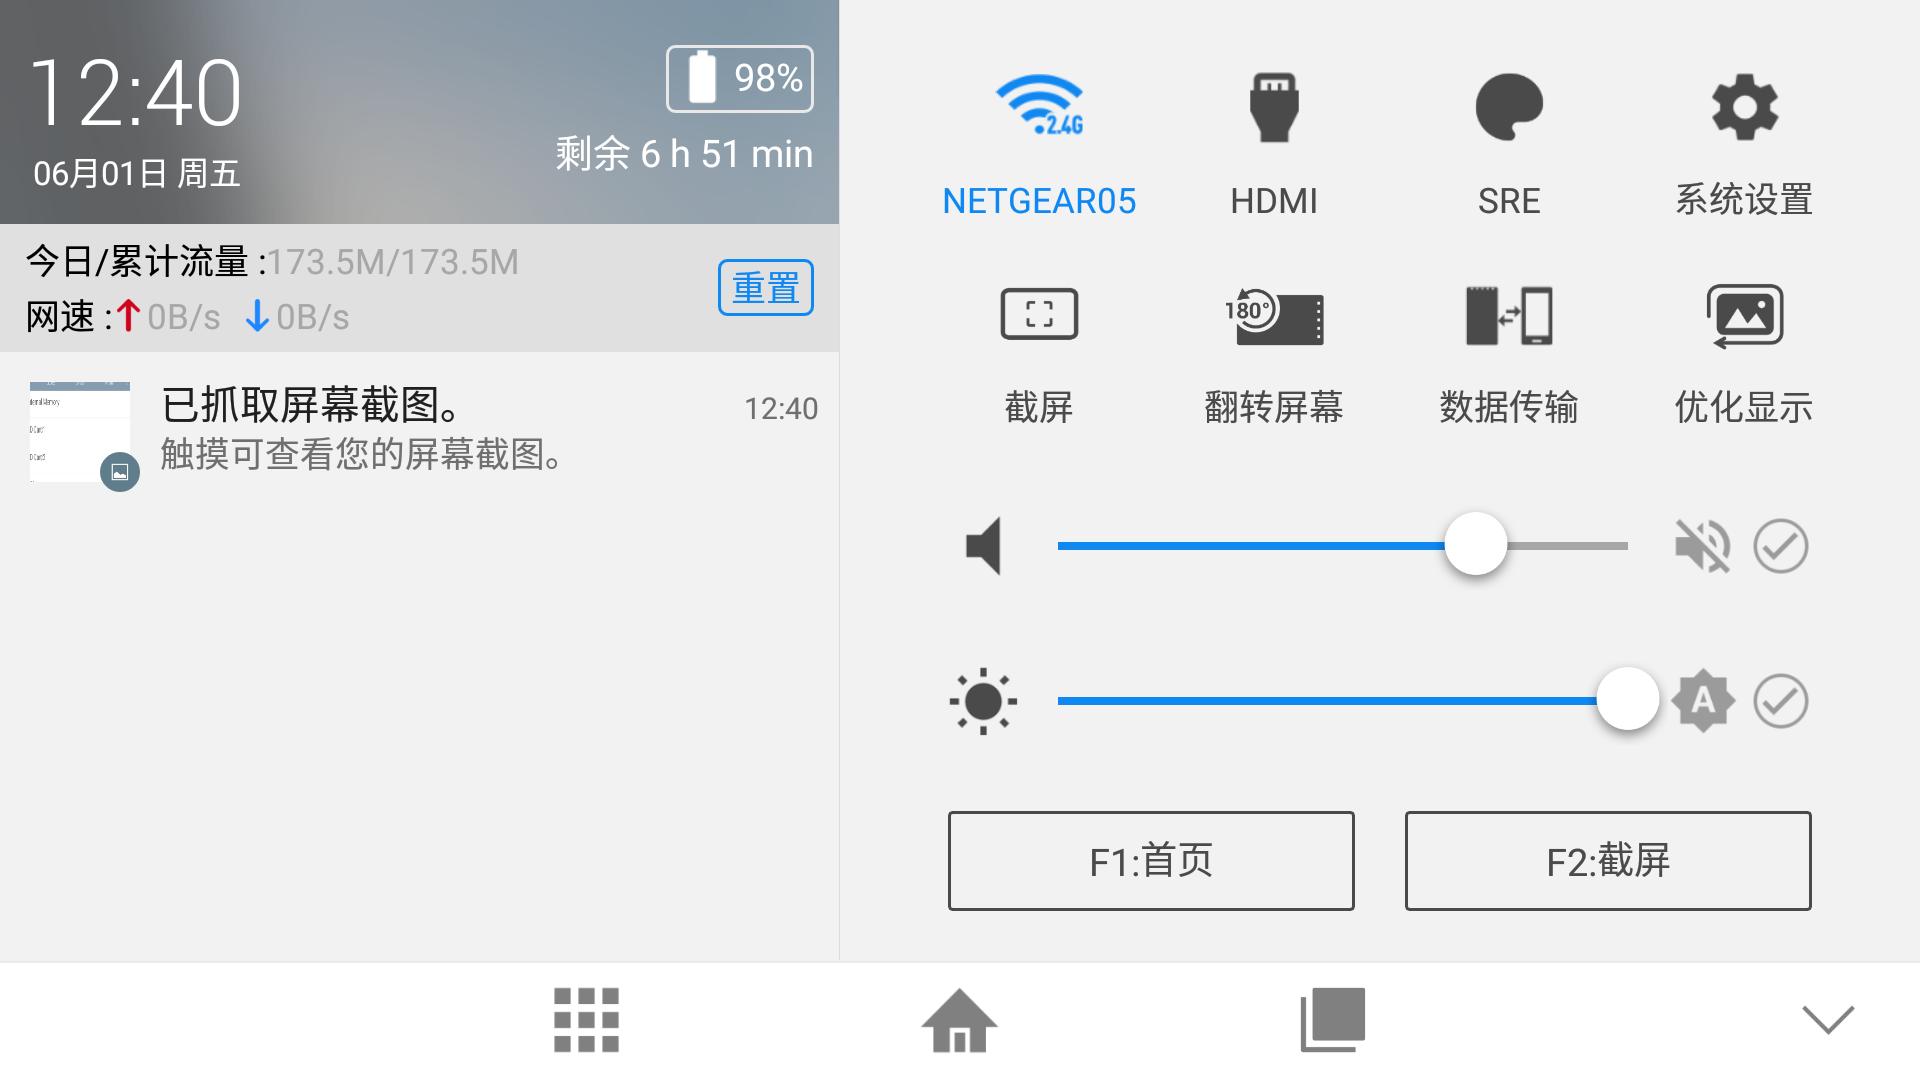 Screenshot_2018-06-01-12-40-09.png